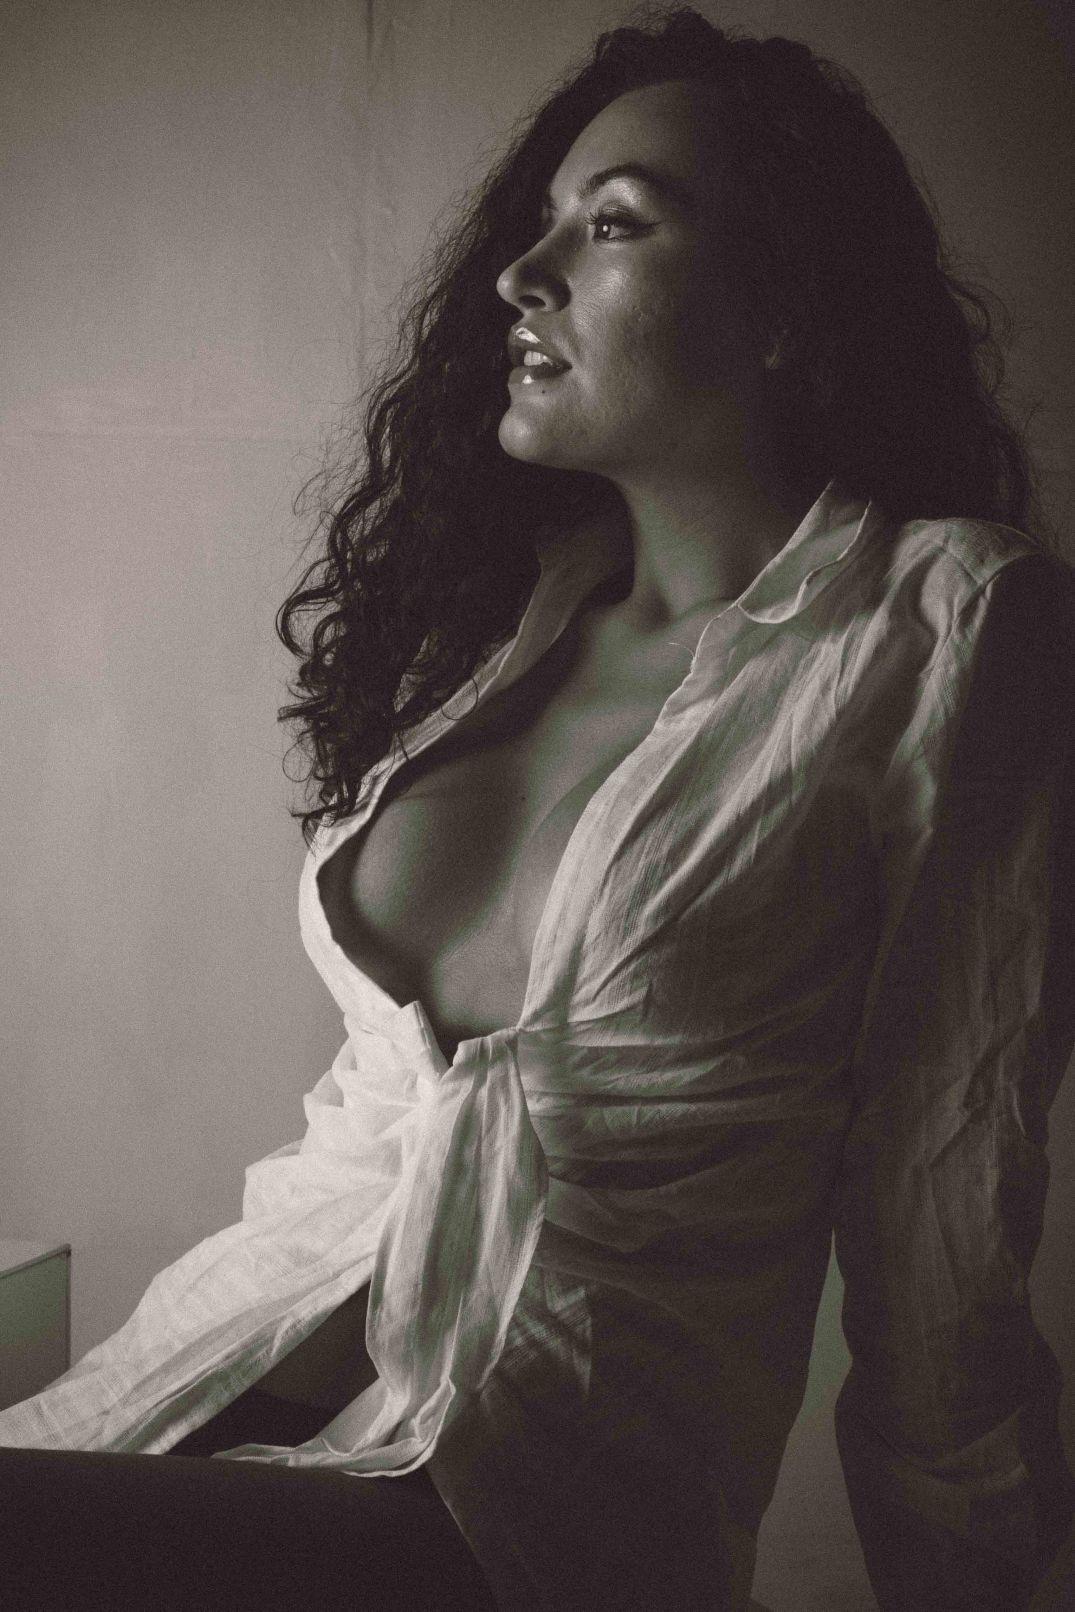 boudior nude photography HK by paulstylist-3